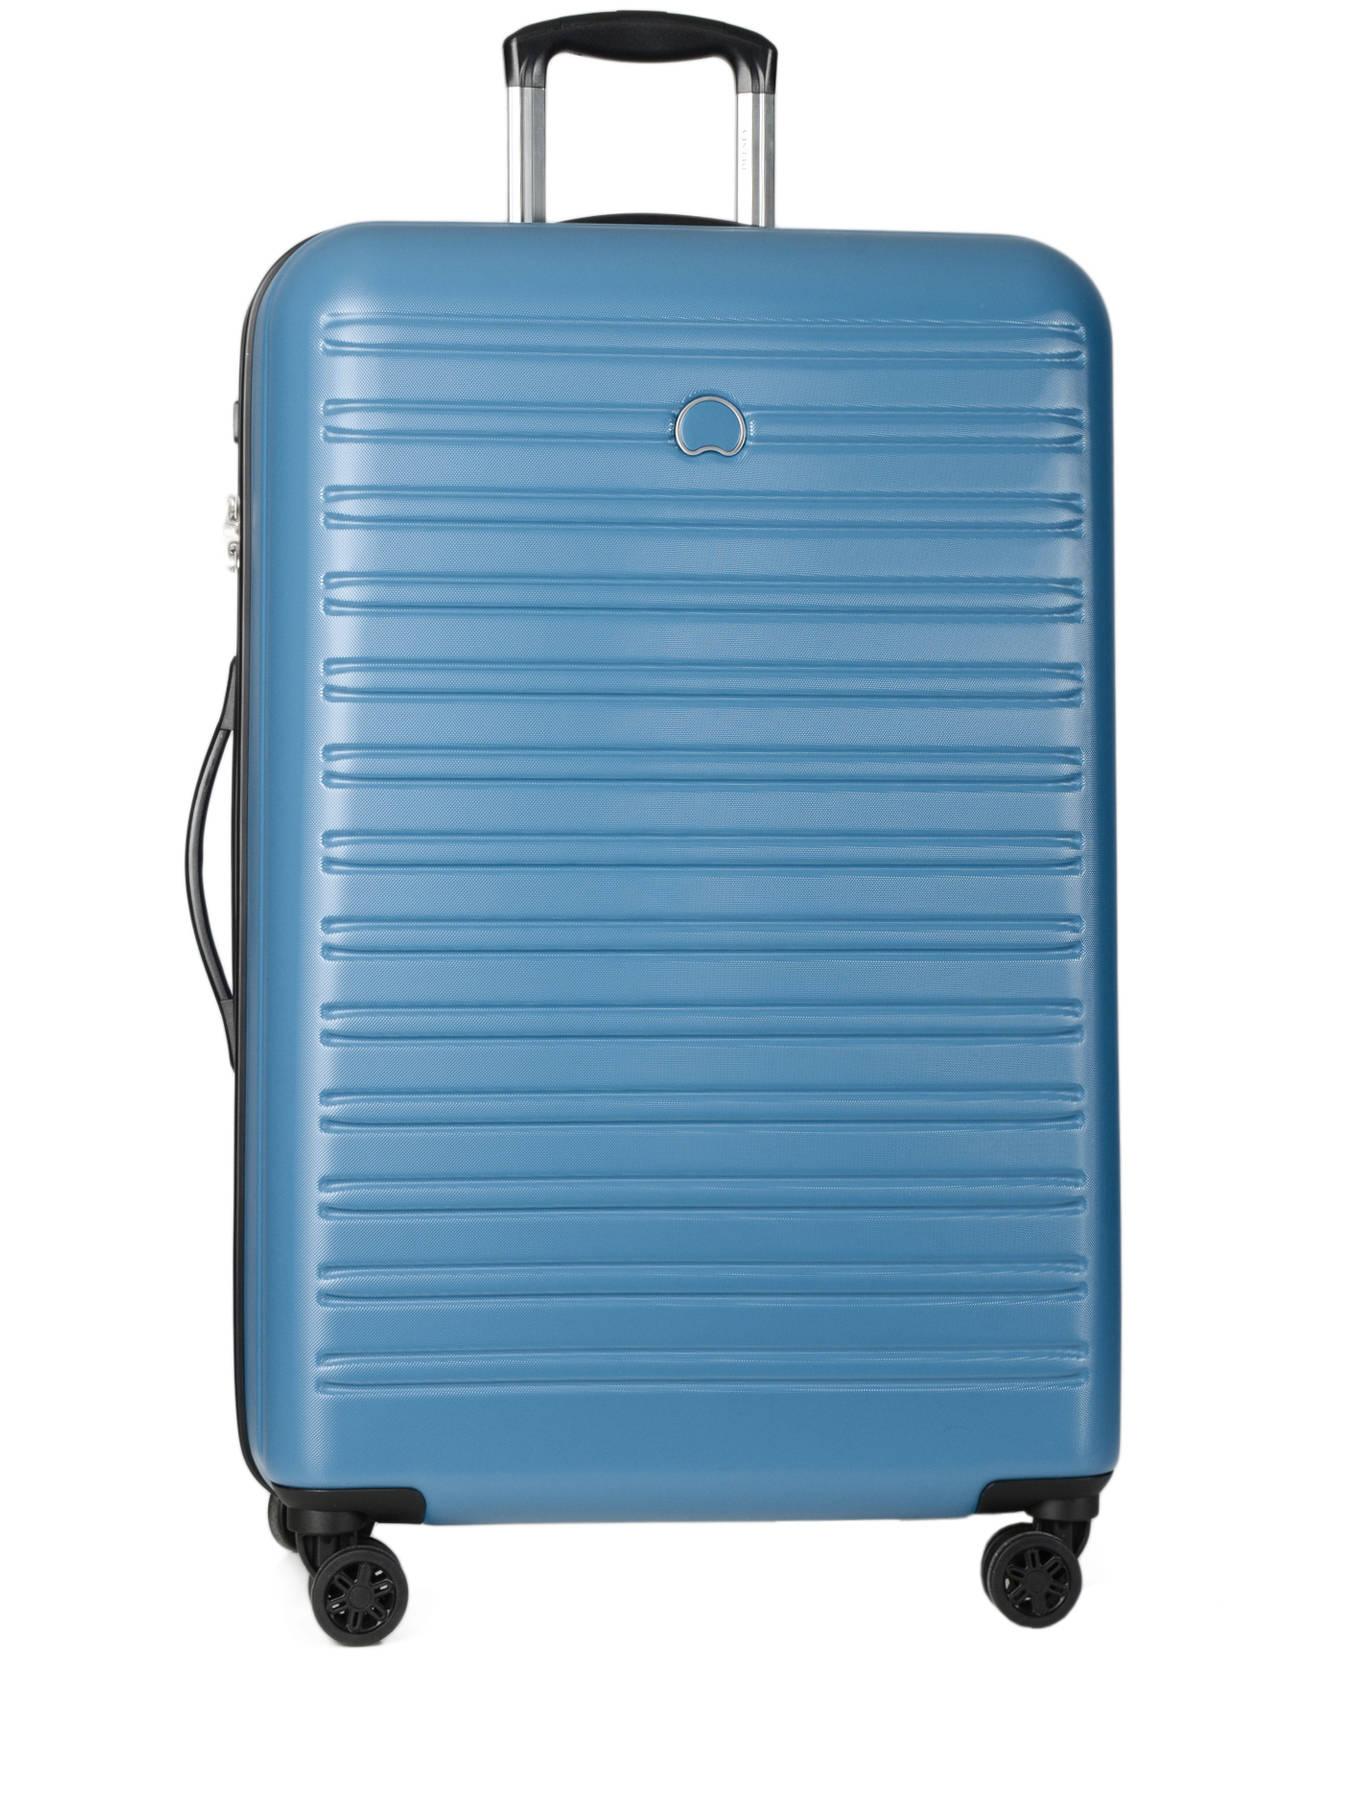 valise rigide delsey segur blue en vente au meilleur prix. Black Bedroom Furniture Sets. Home Design Ideas